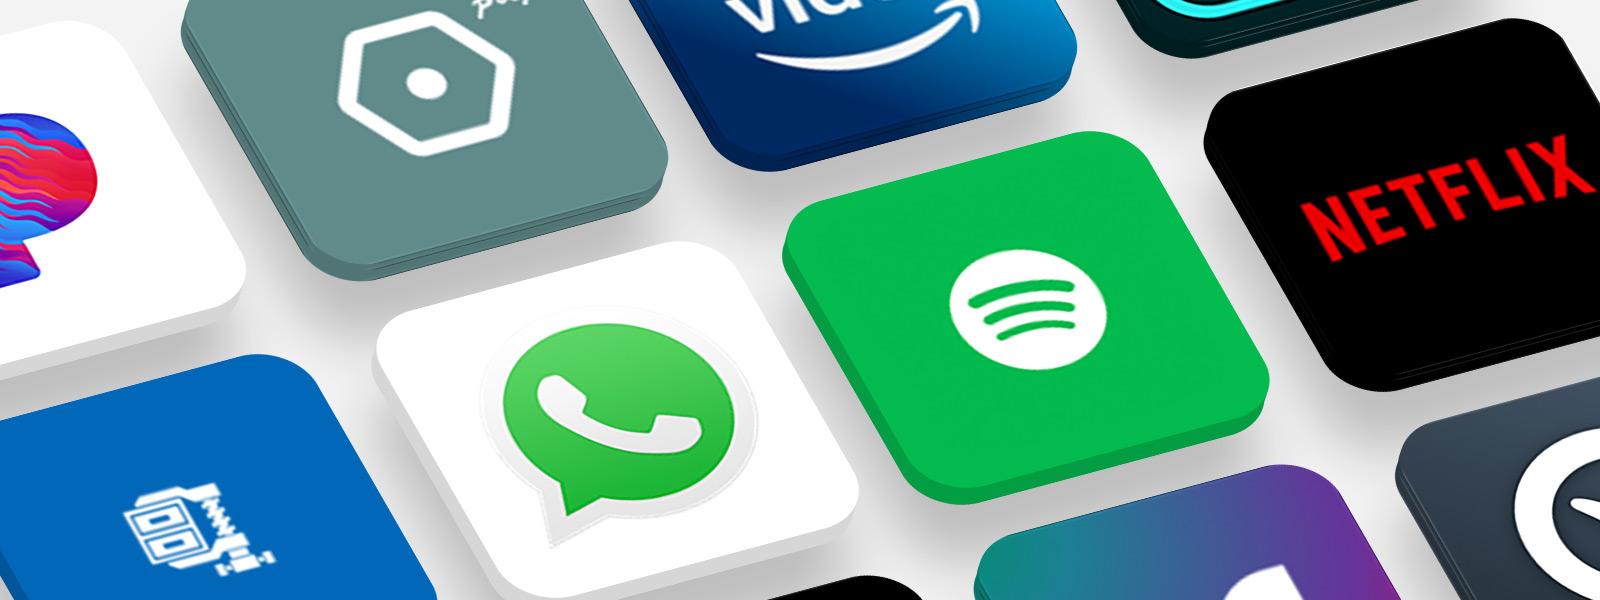 Viele beliebte Anwendungslogos